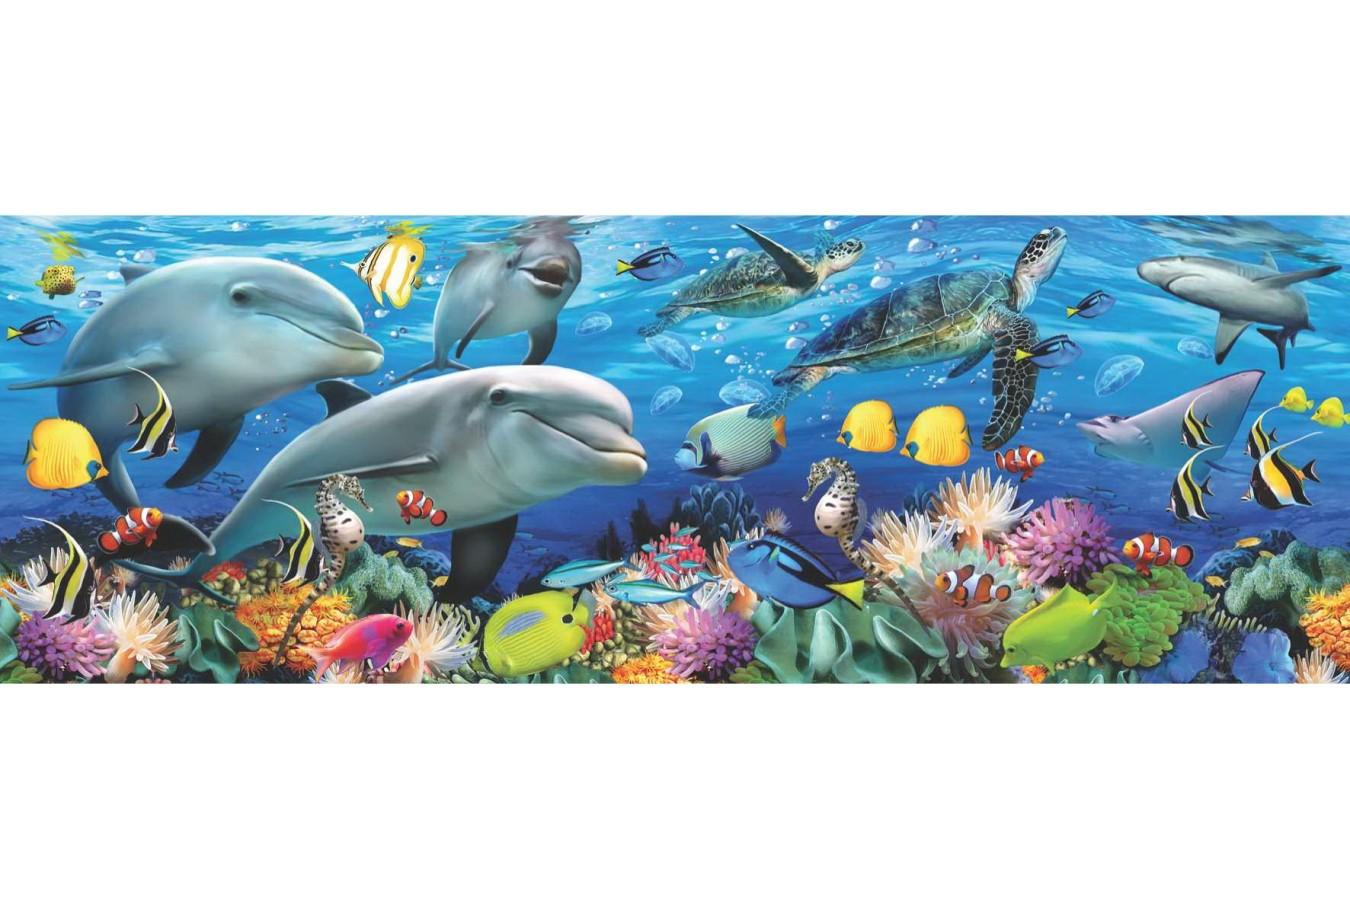 Puzzle Anatolian - Undersea, 1000 piese, panoramic (1009)